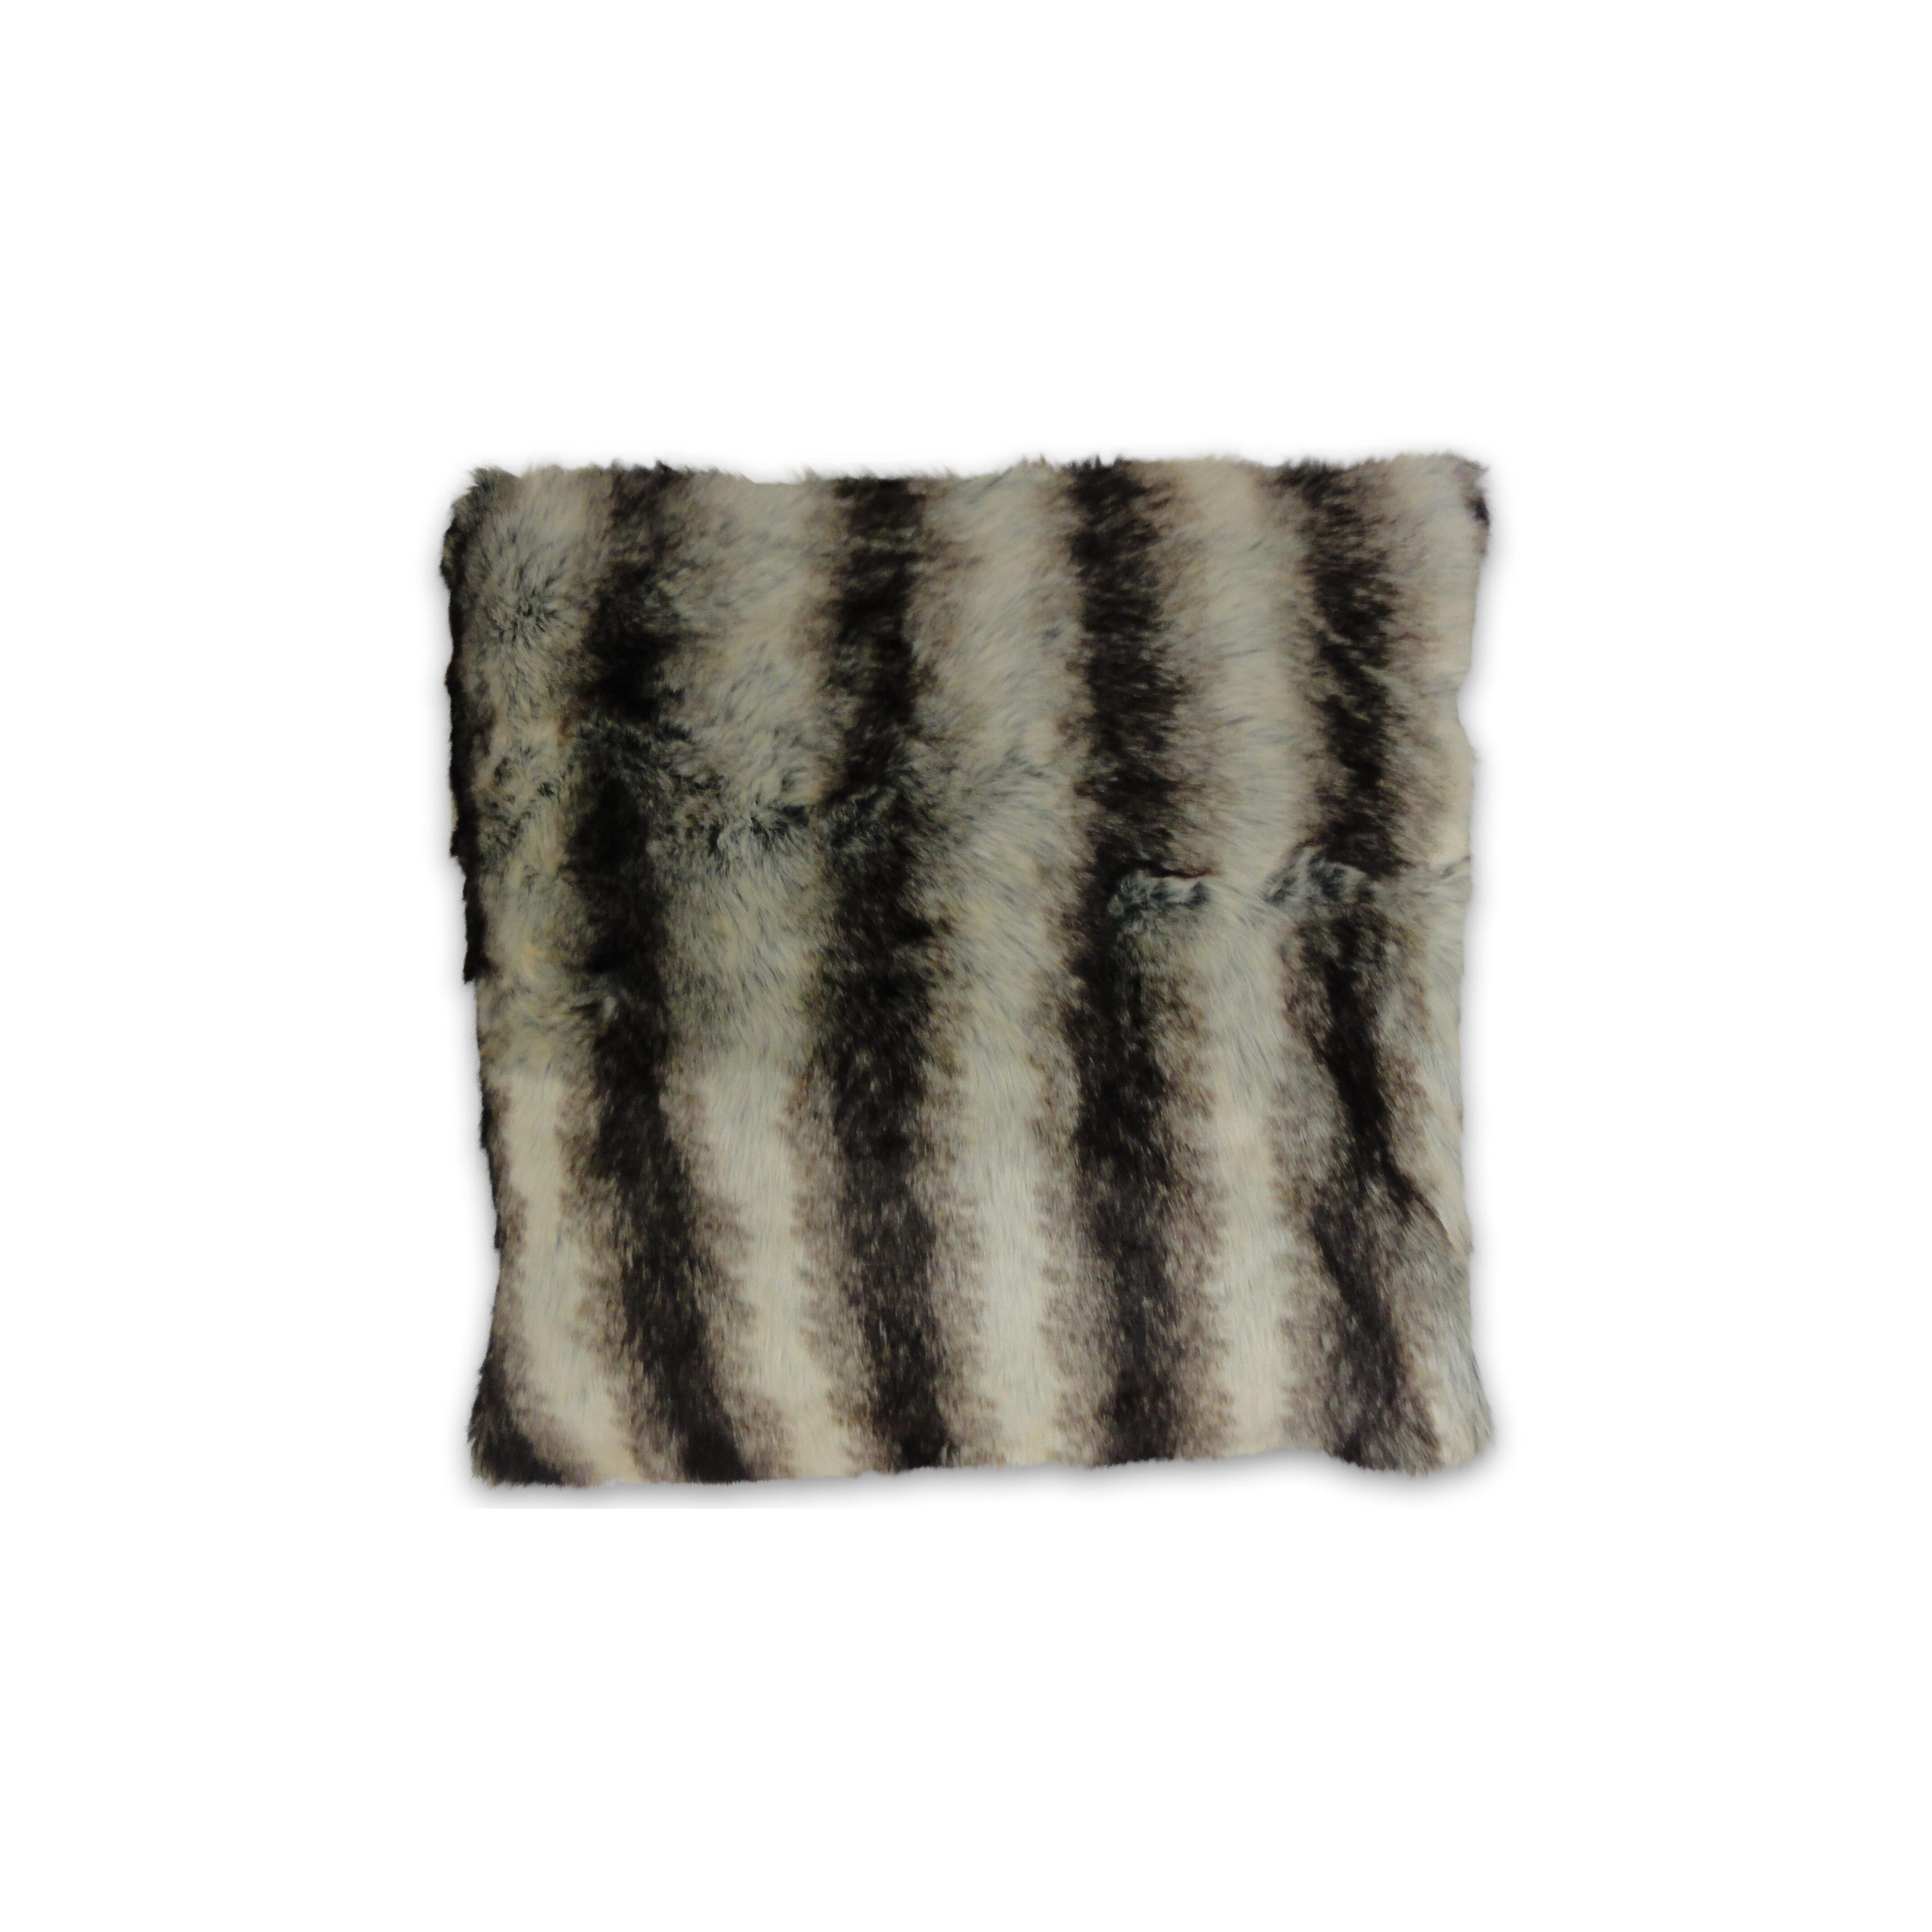 Black Fur Throw Pillows : DR International Brengar Faux Fur Throw Pillow & Reviews Wayfair